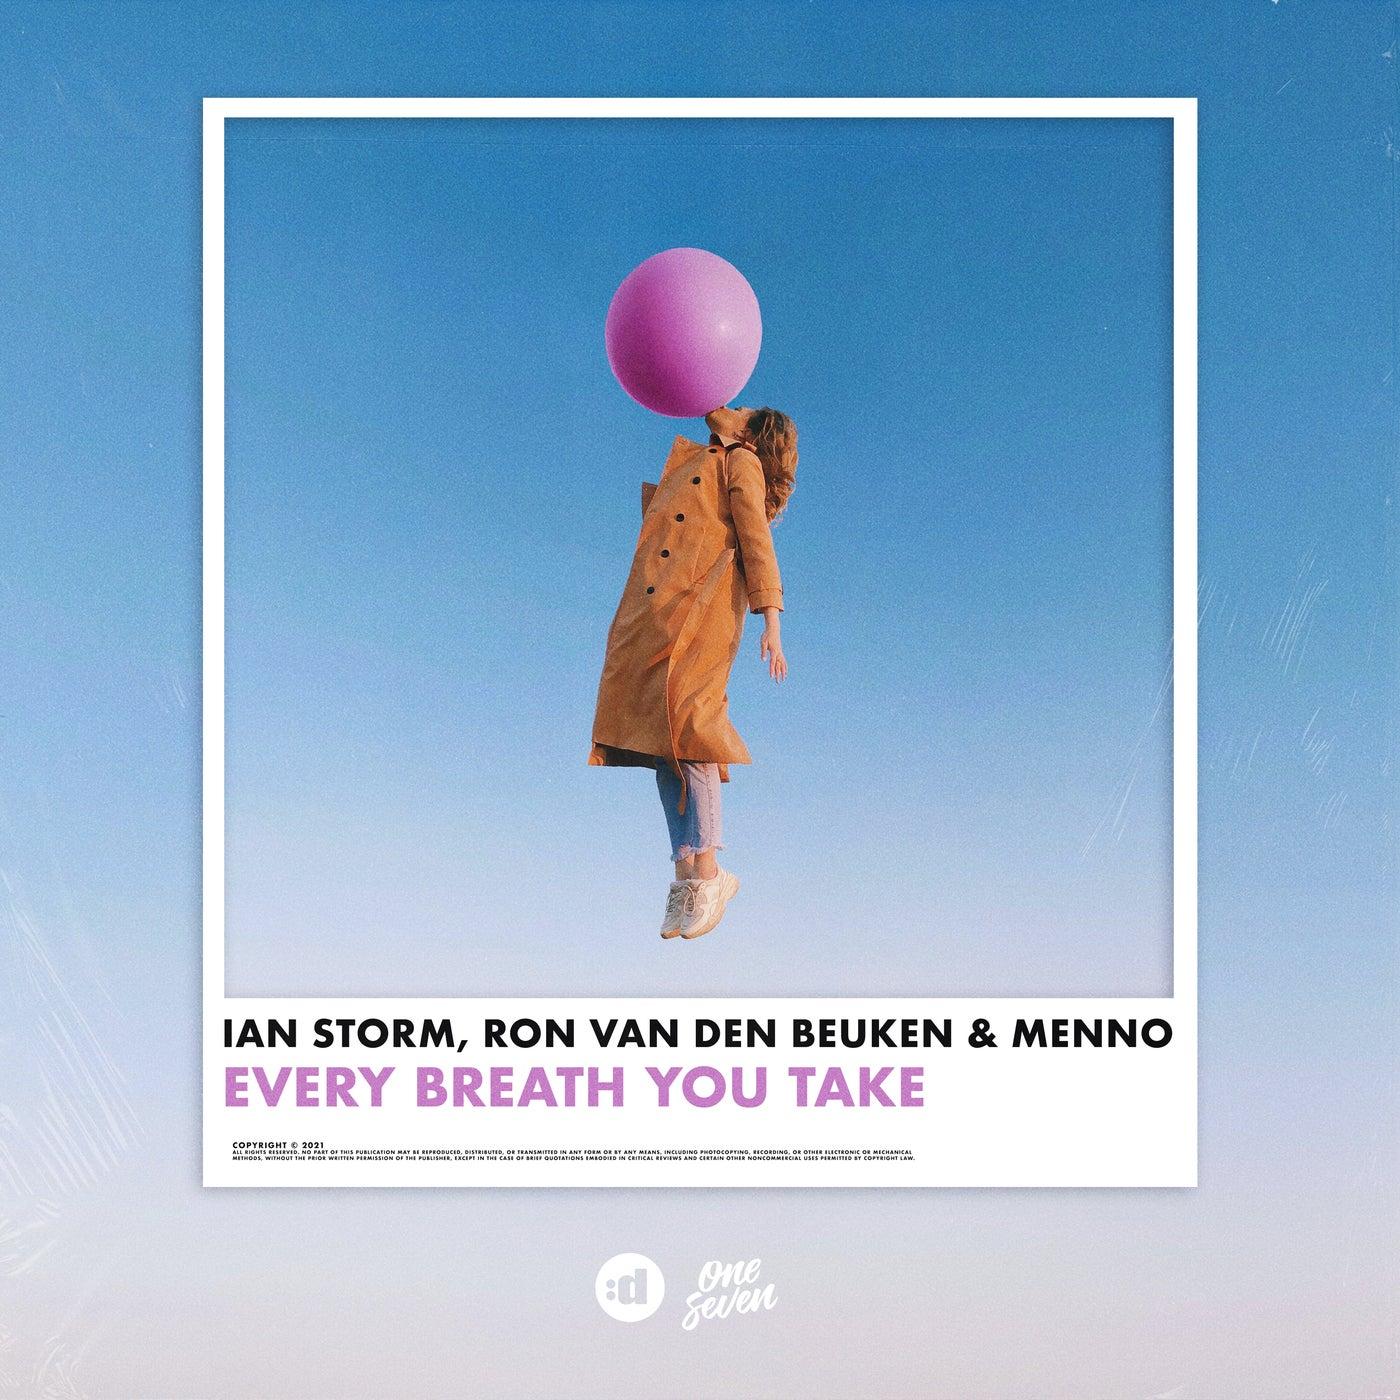 Ian Storm, Ron Van Den Beuken, Menno - Every Breath You Take (Original Mix)